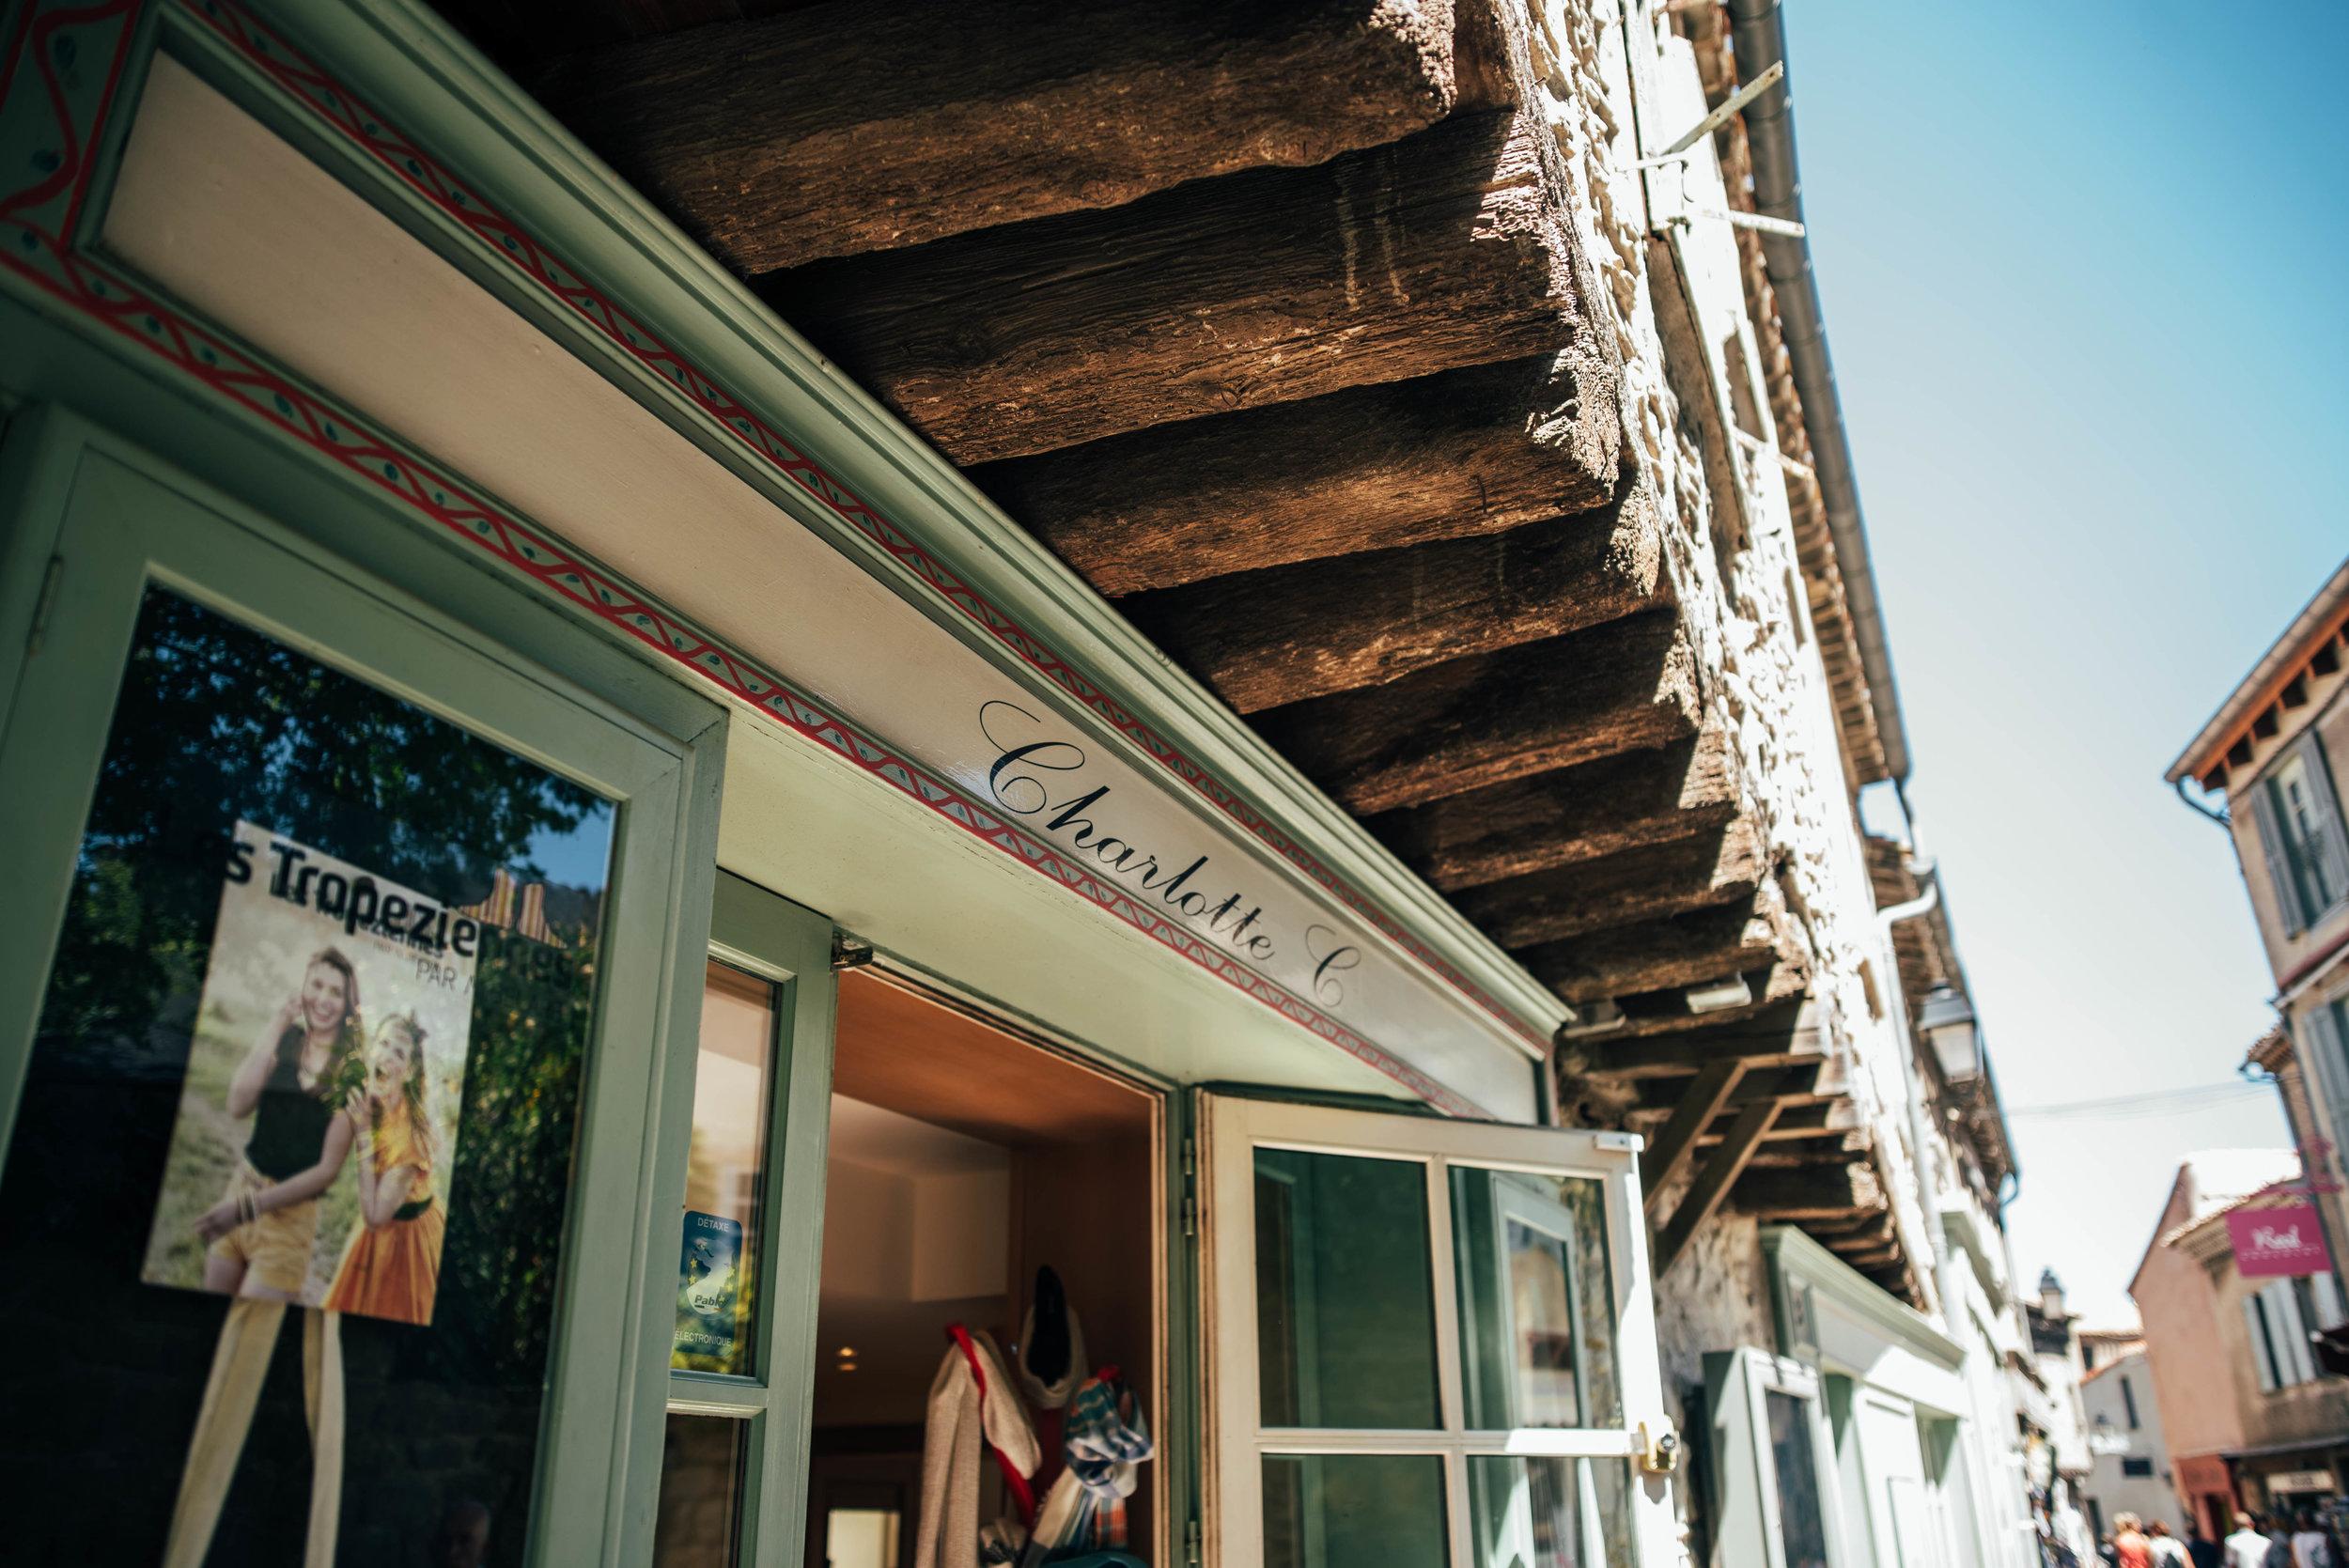 Shops Carcassonne Citadel France Essex UK Documentary Photographer